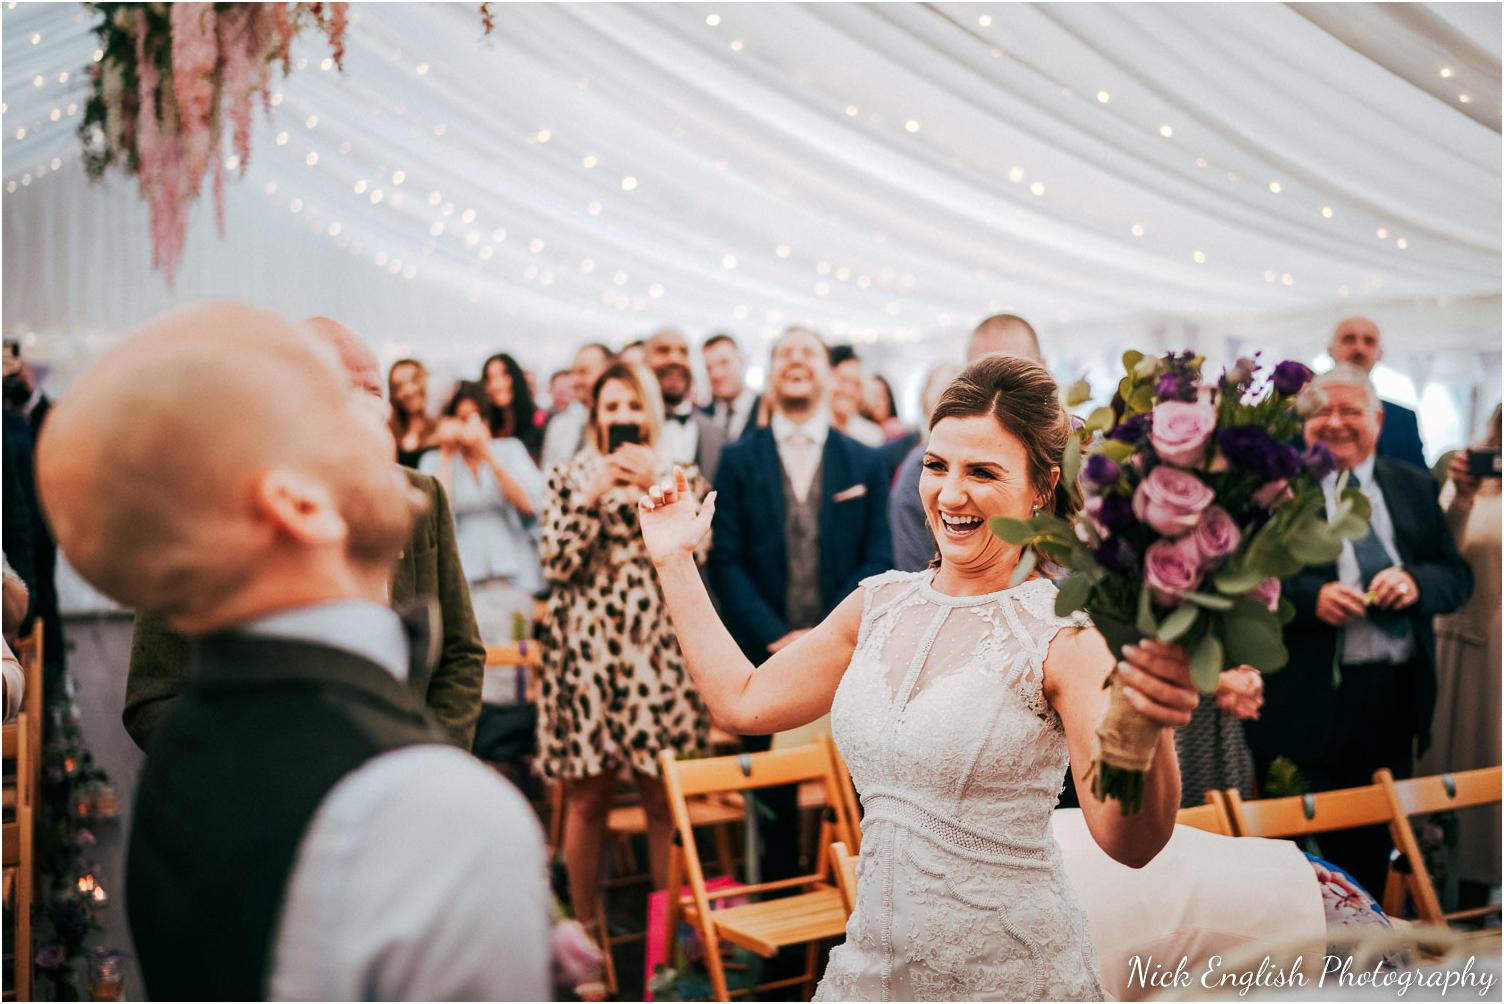 Spring_Cottage_Rivington_Lancashire_Wedding_Photographs-54.jpg